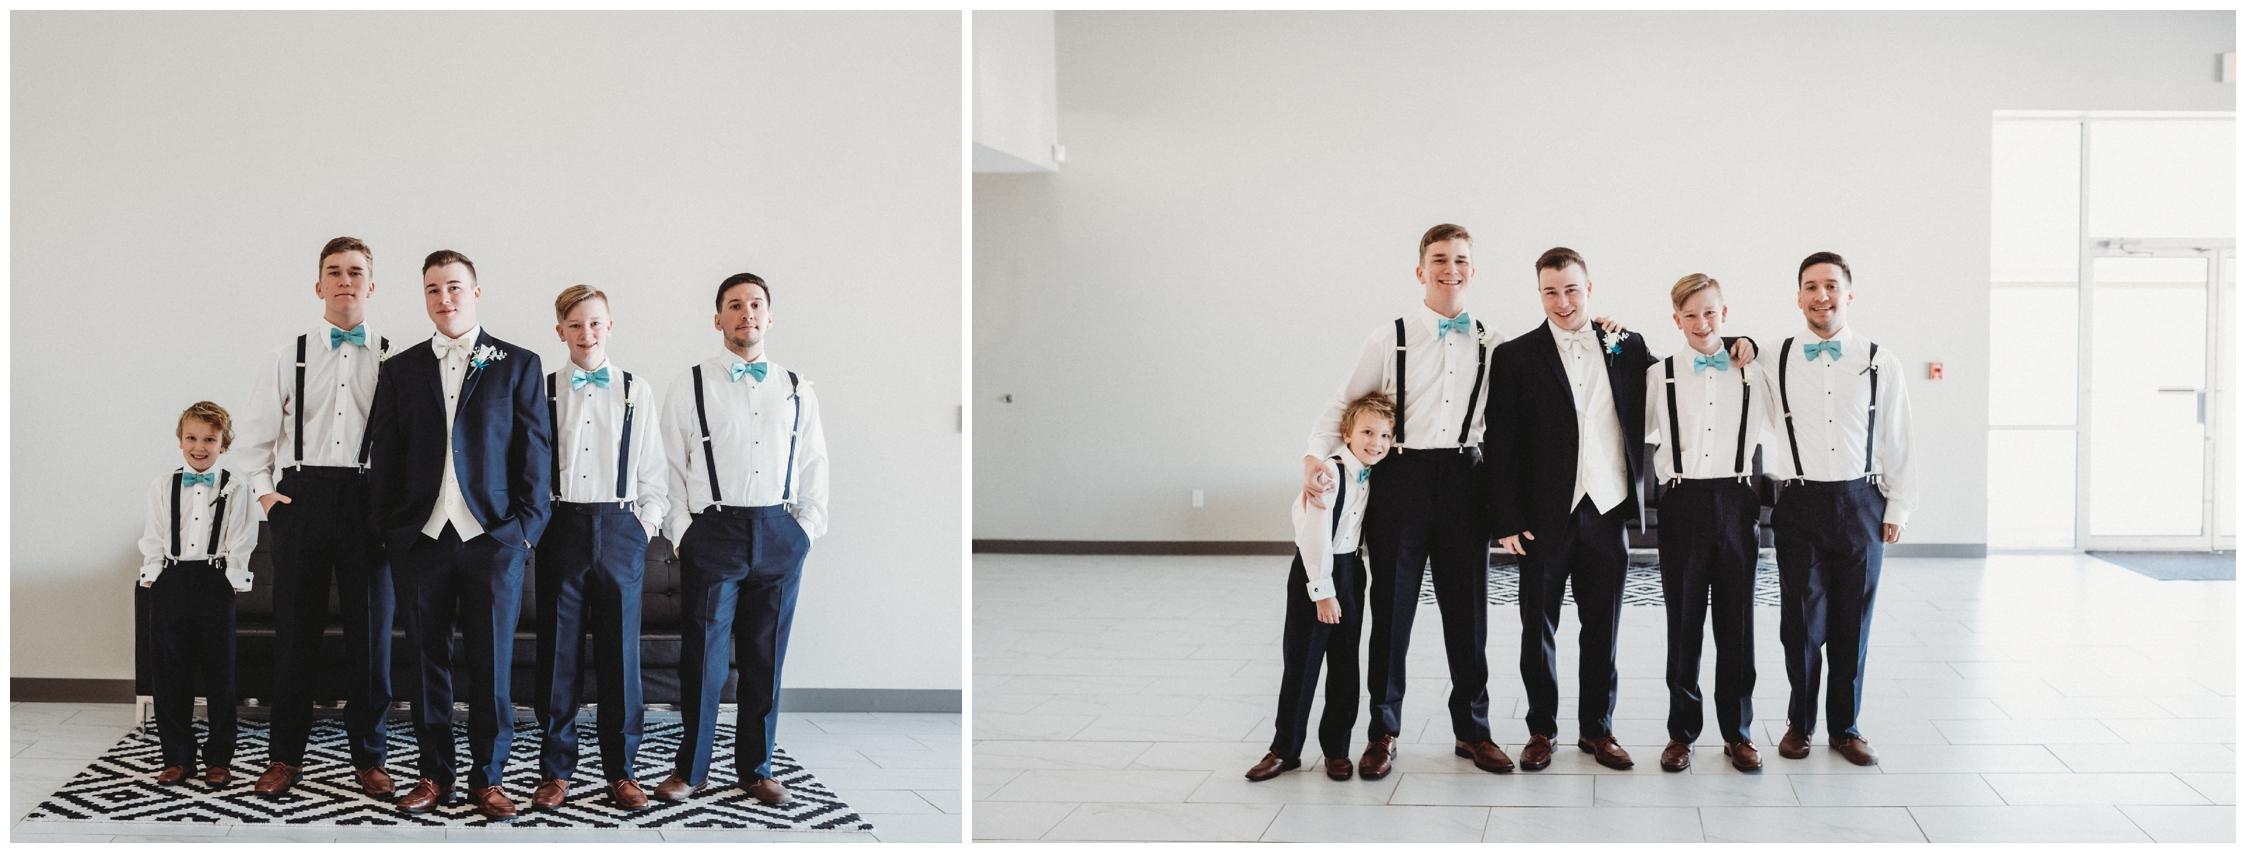 Baton Rouge-Wedding Photographer